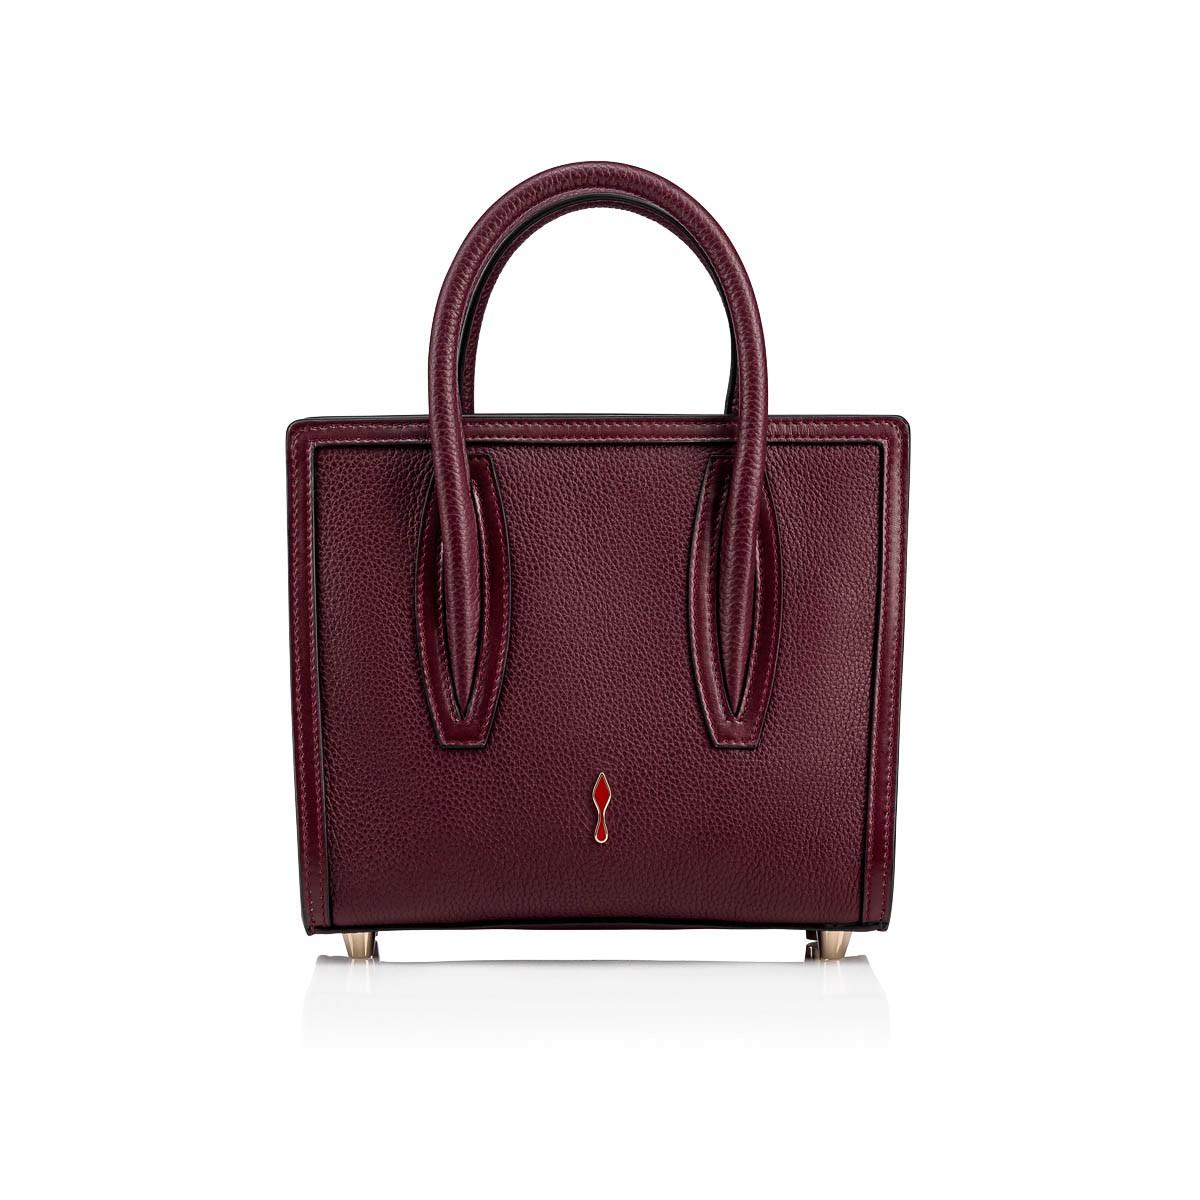 Bags - Paloma S Mini - Christian Louboutin